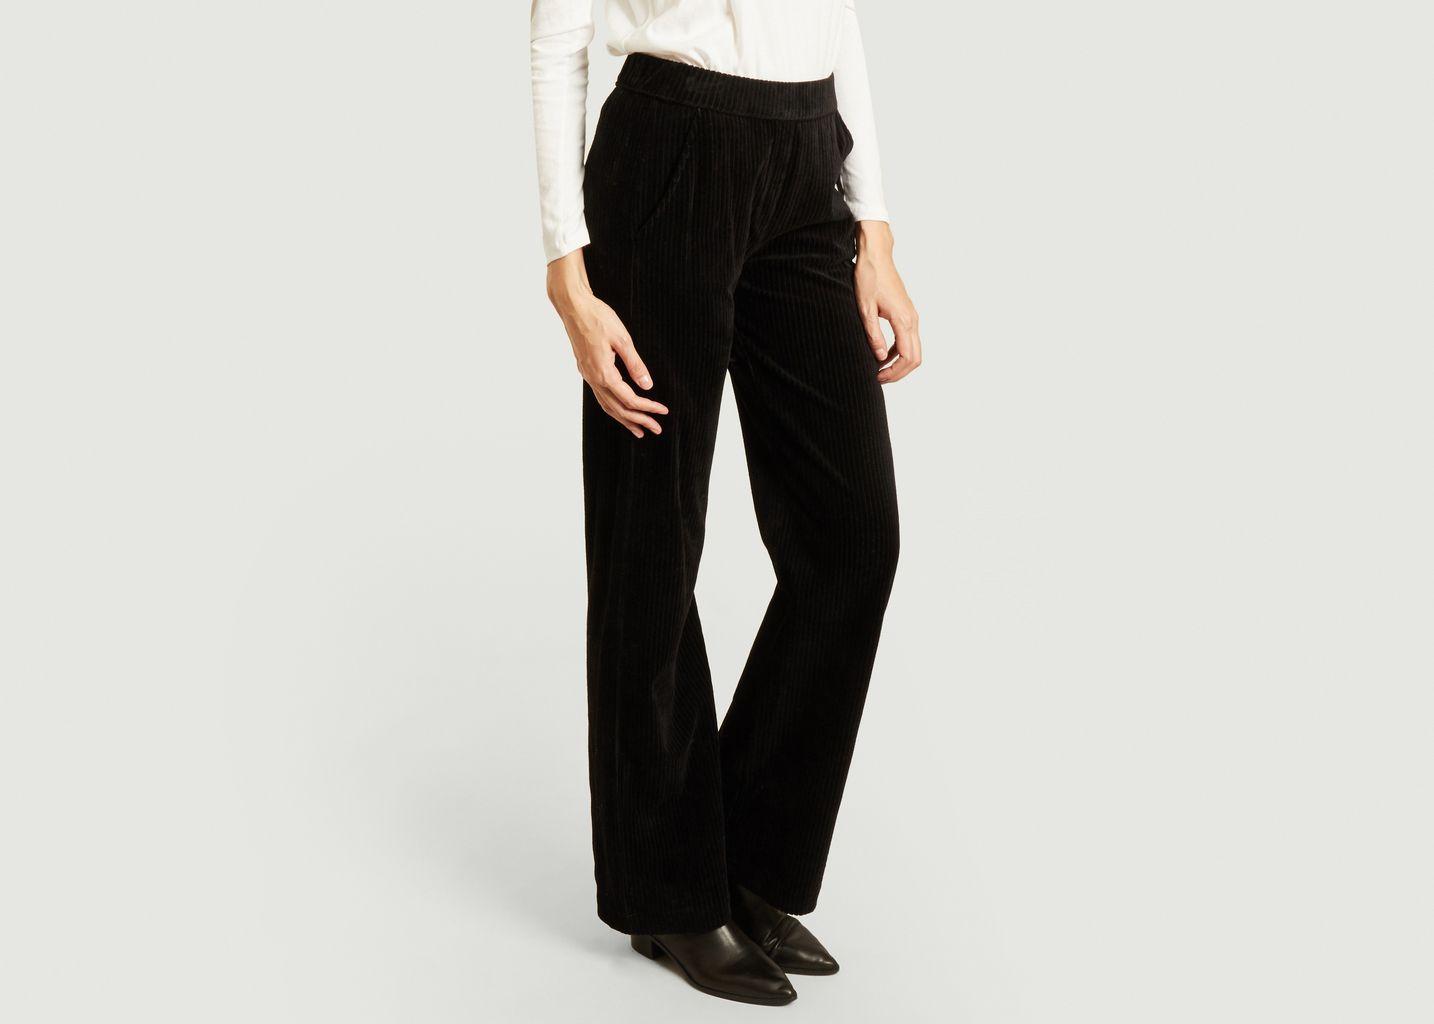 pantalon velours grosse côtes flare - Majestic Filatures